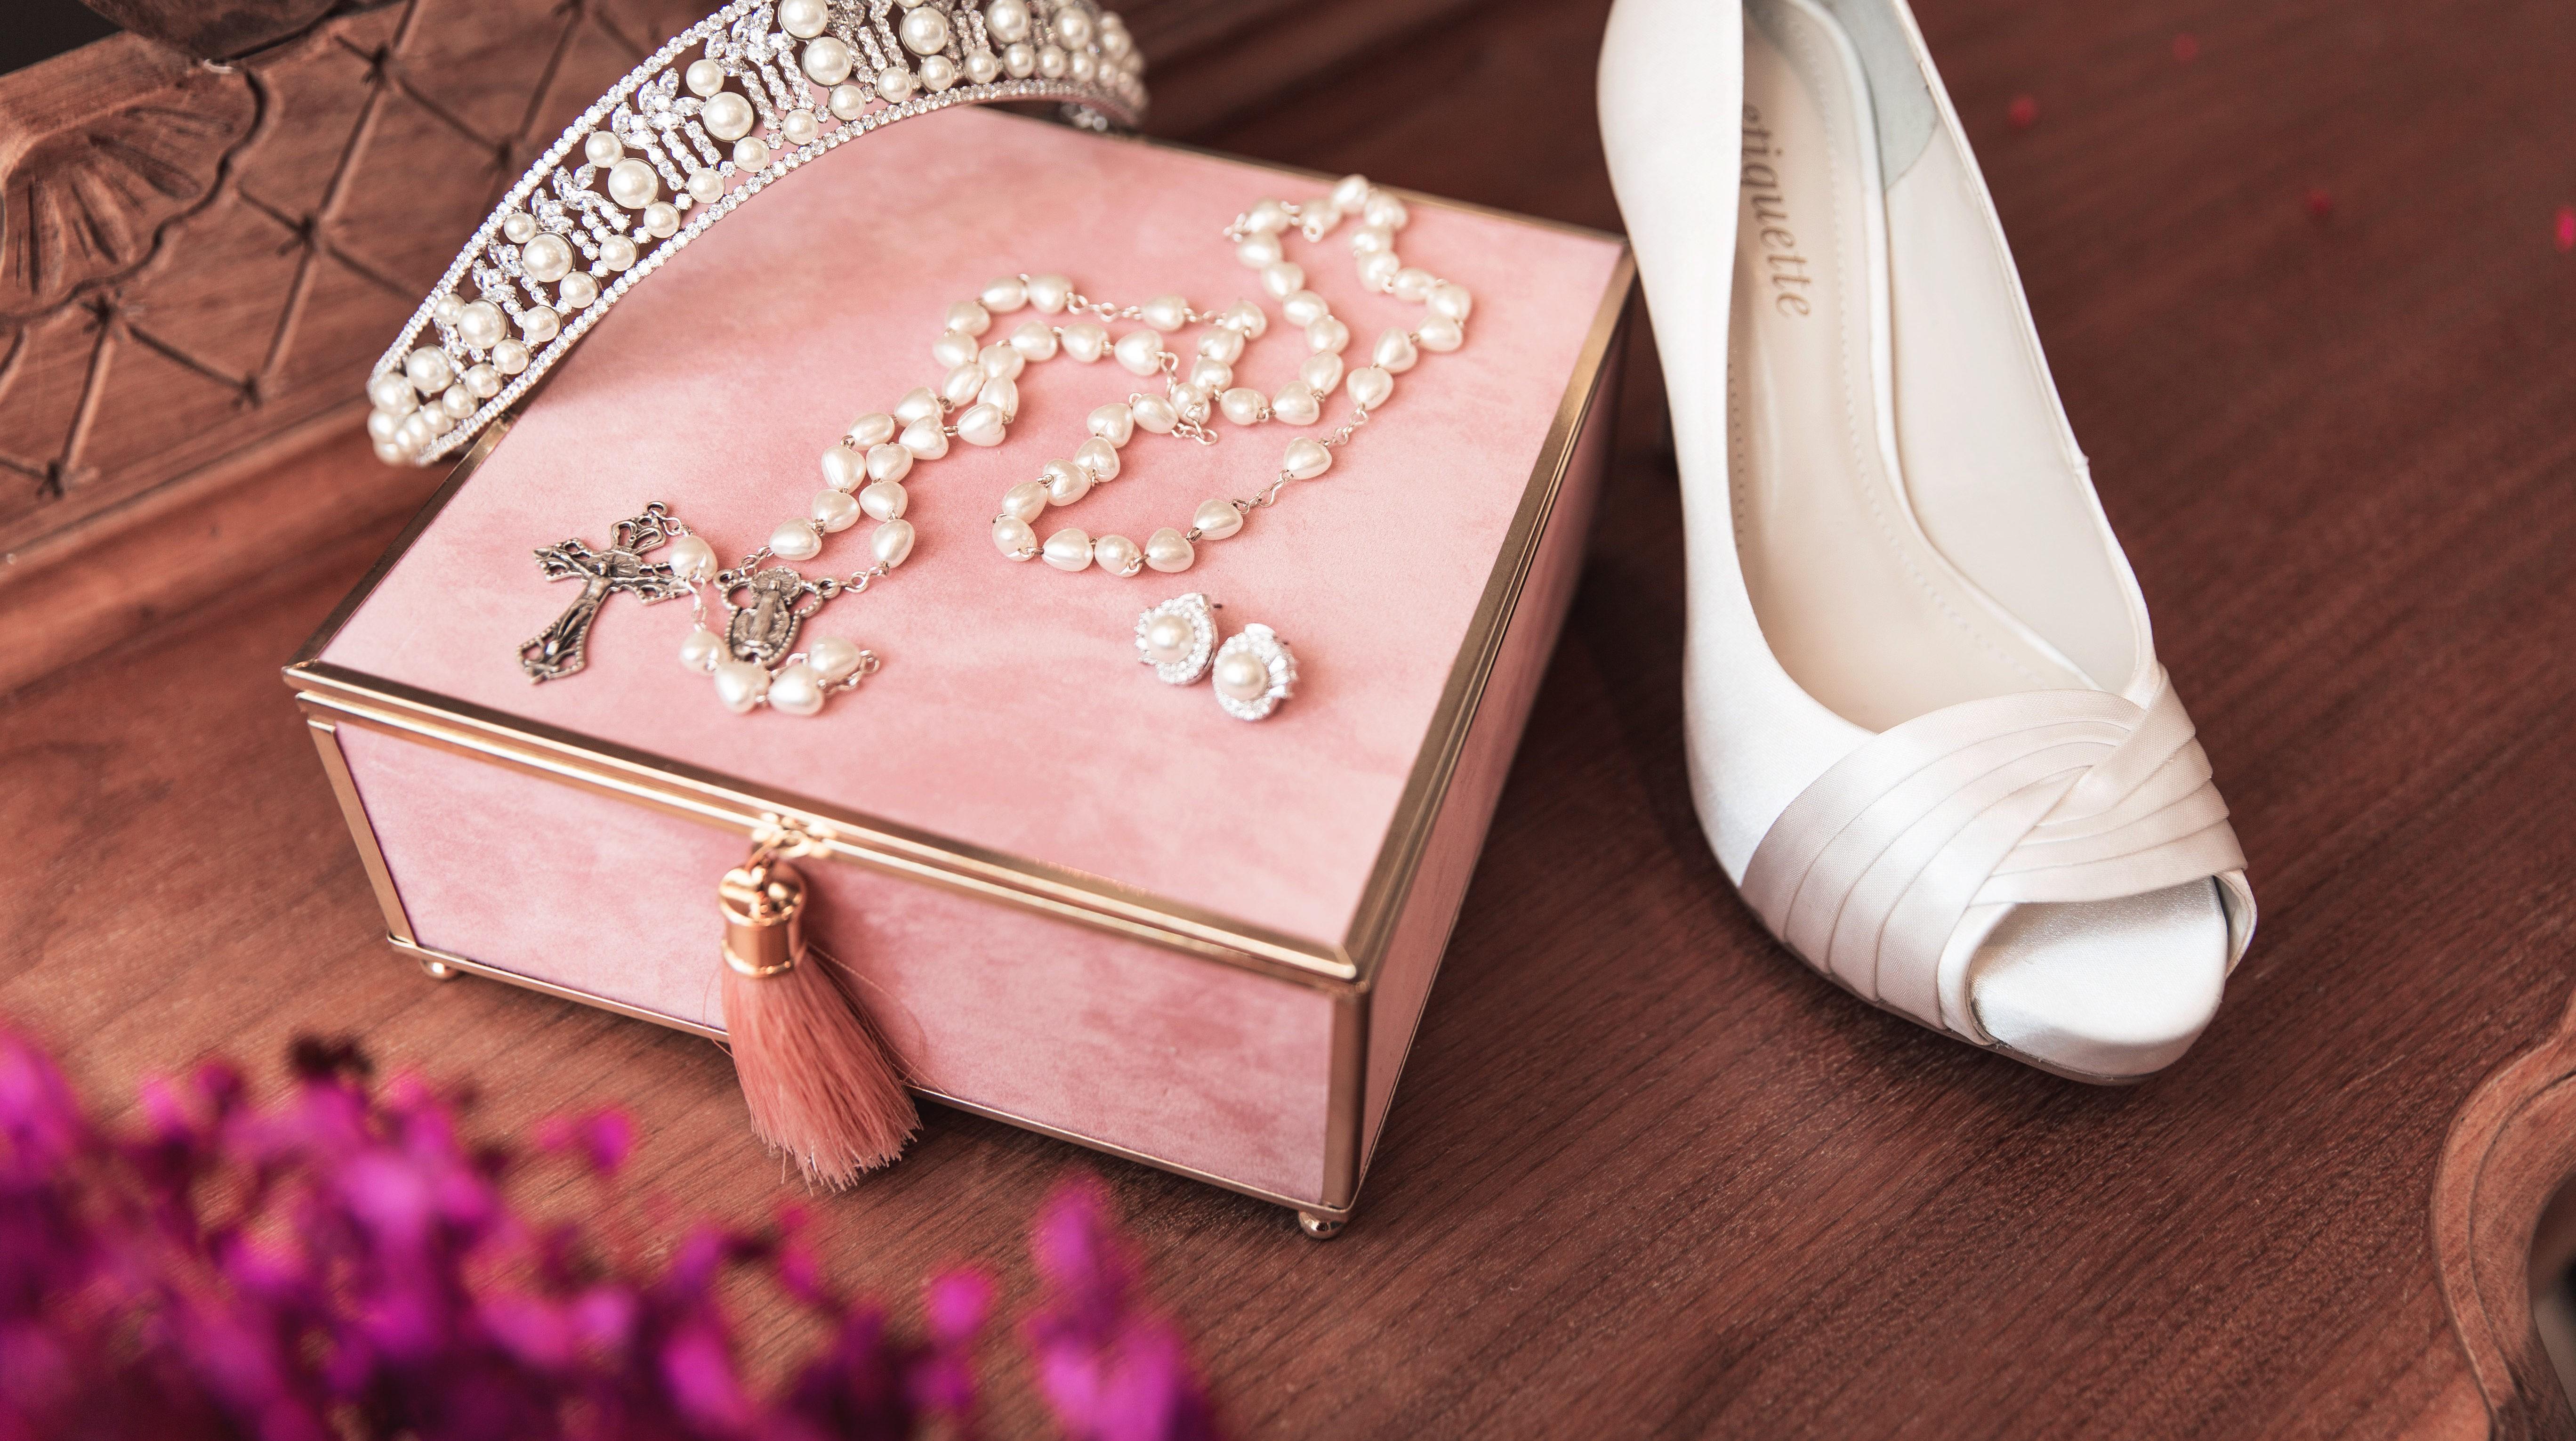 Sapato branco para noiva, tiara  e terço para cerimônia.